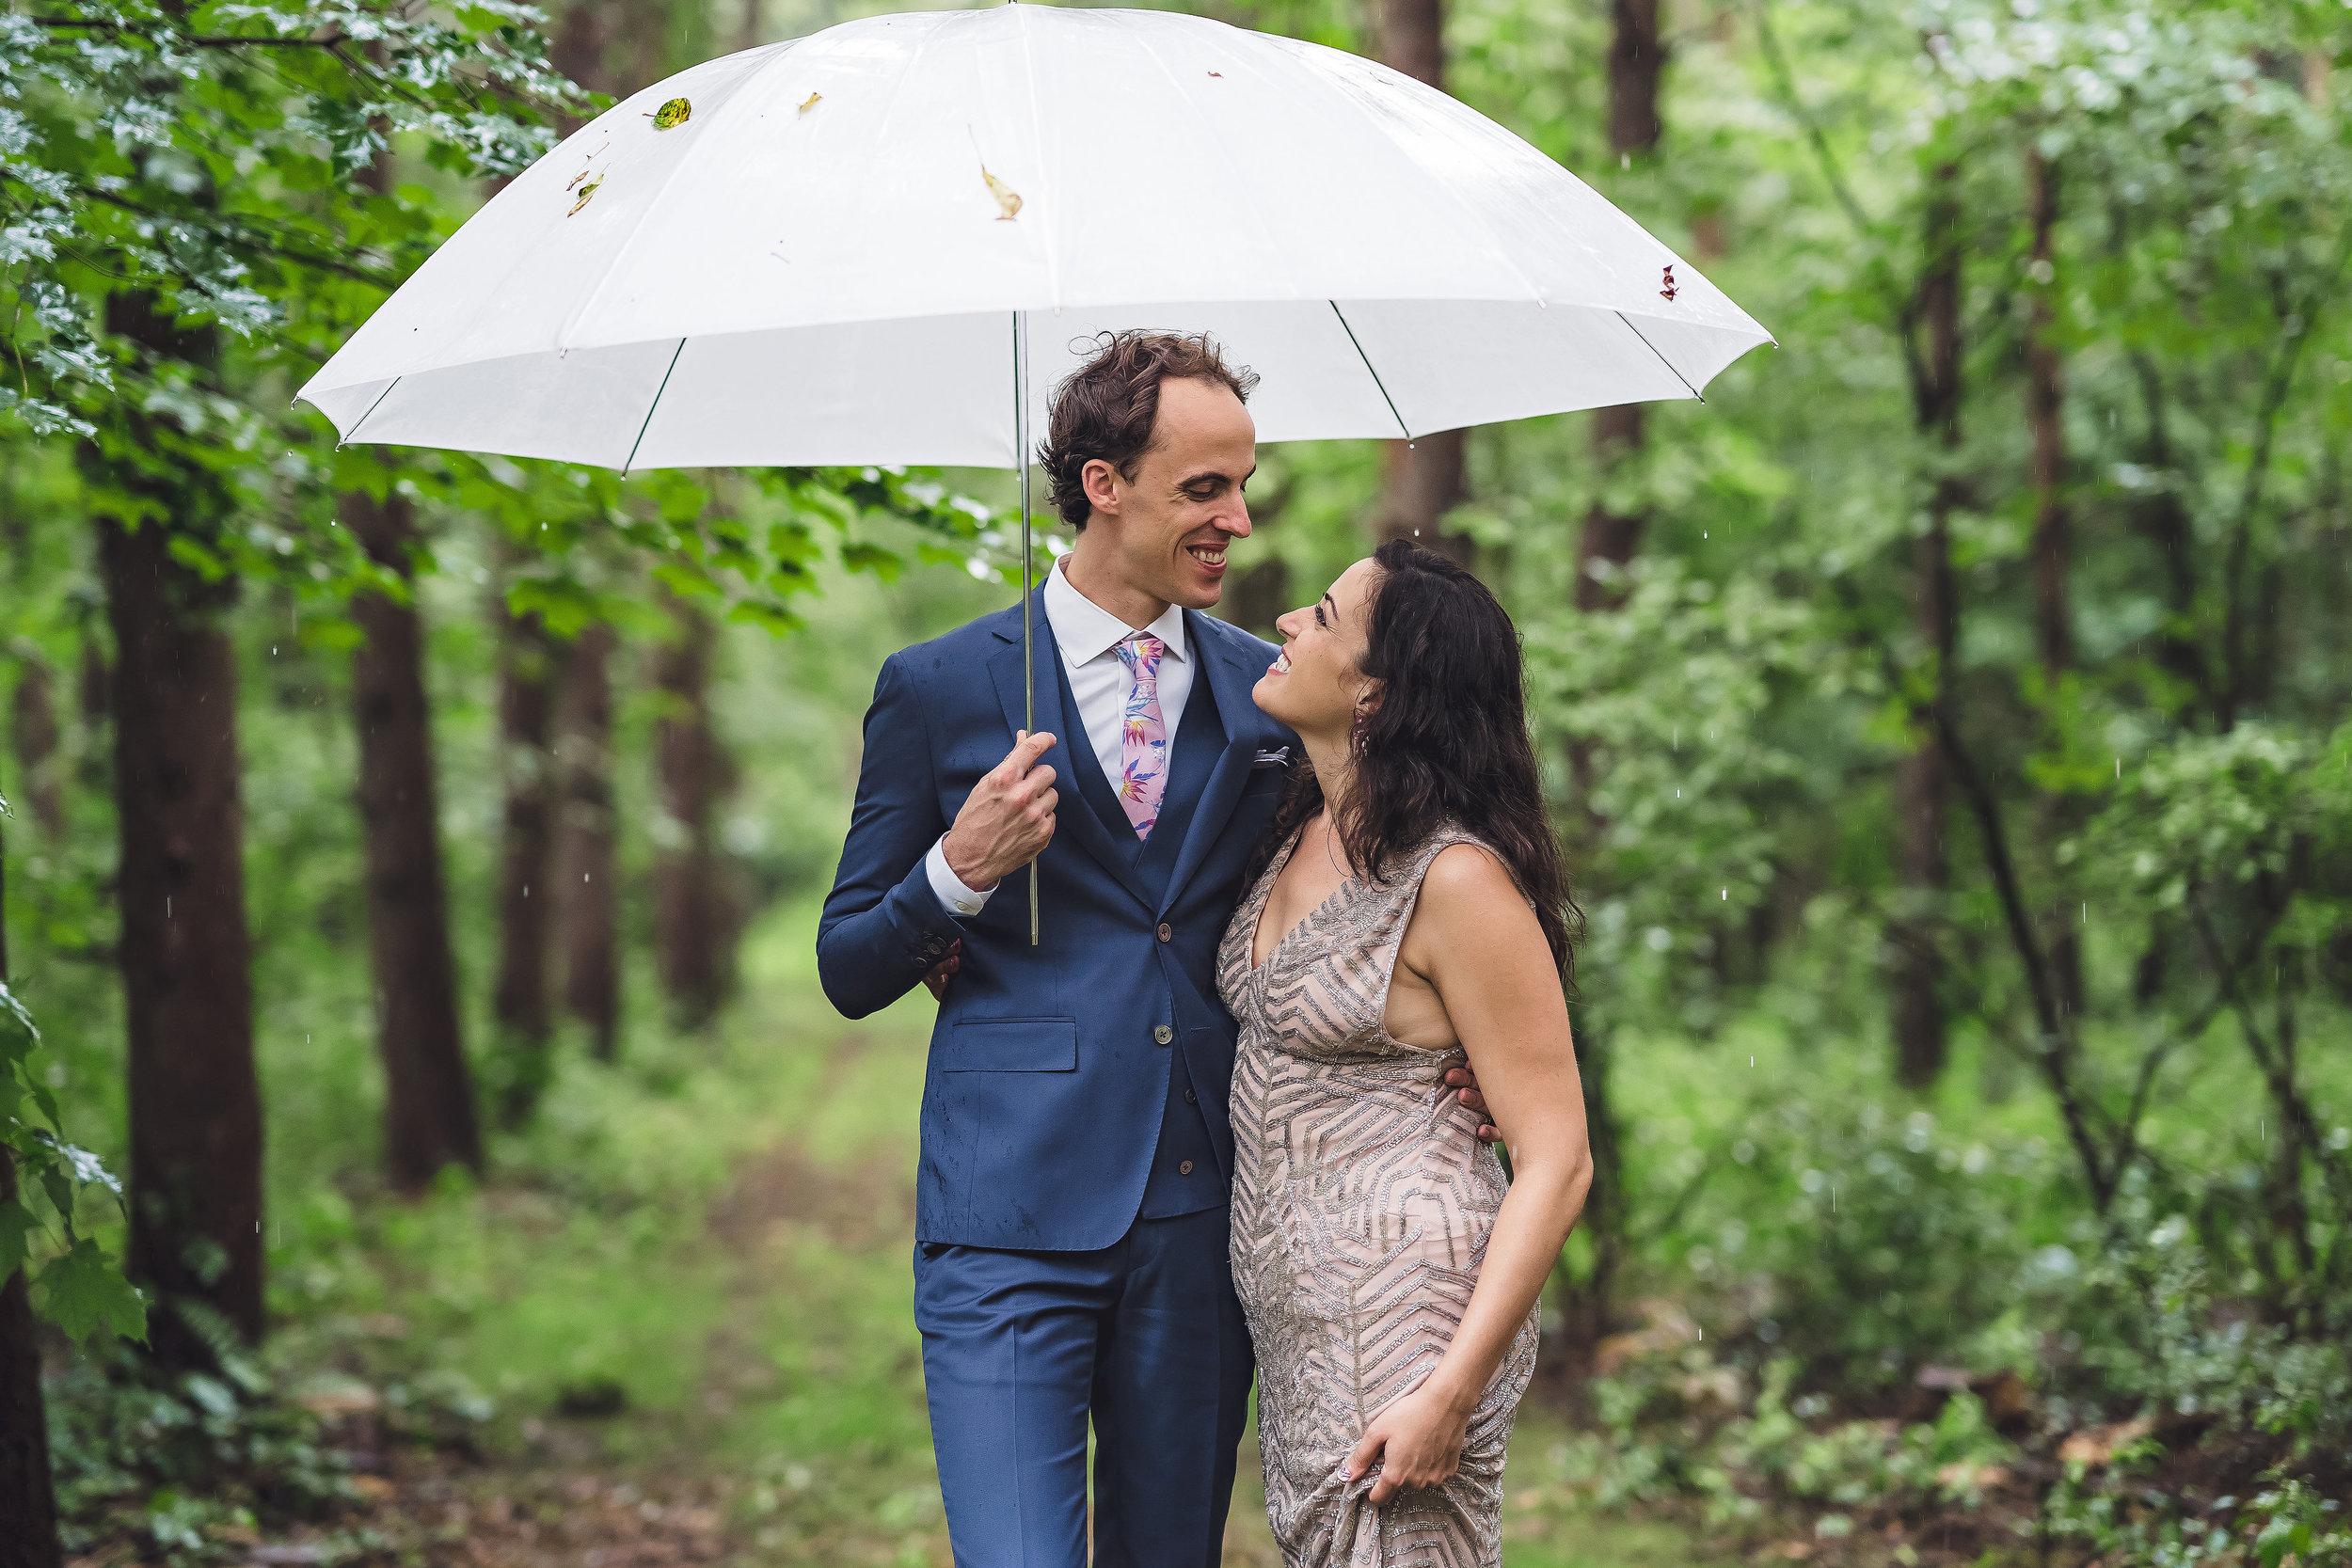 upstate-ny-wedding-jove-meyer-events-inbal-sivan-086.jpg